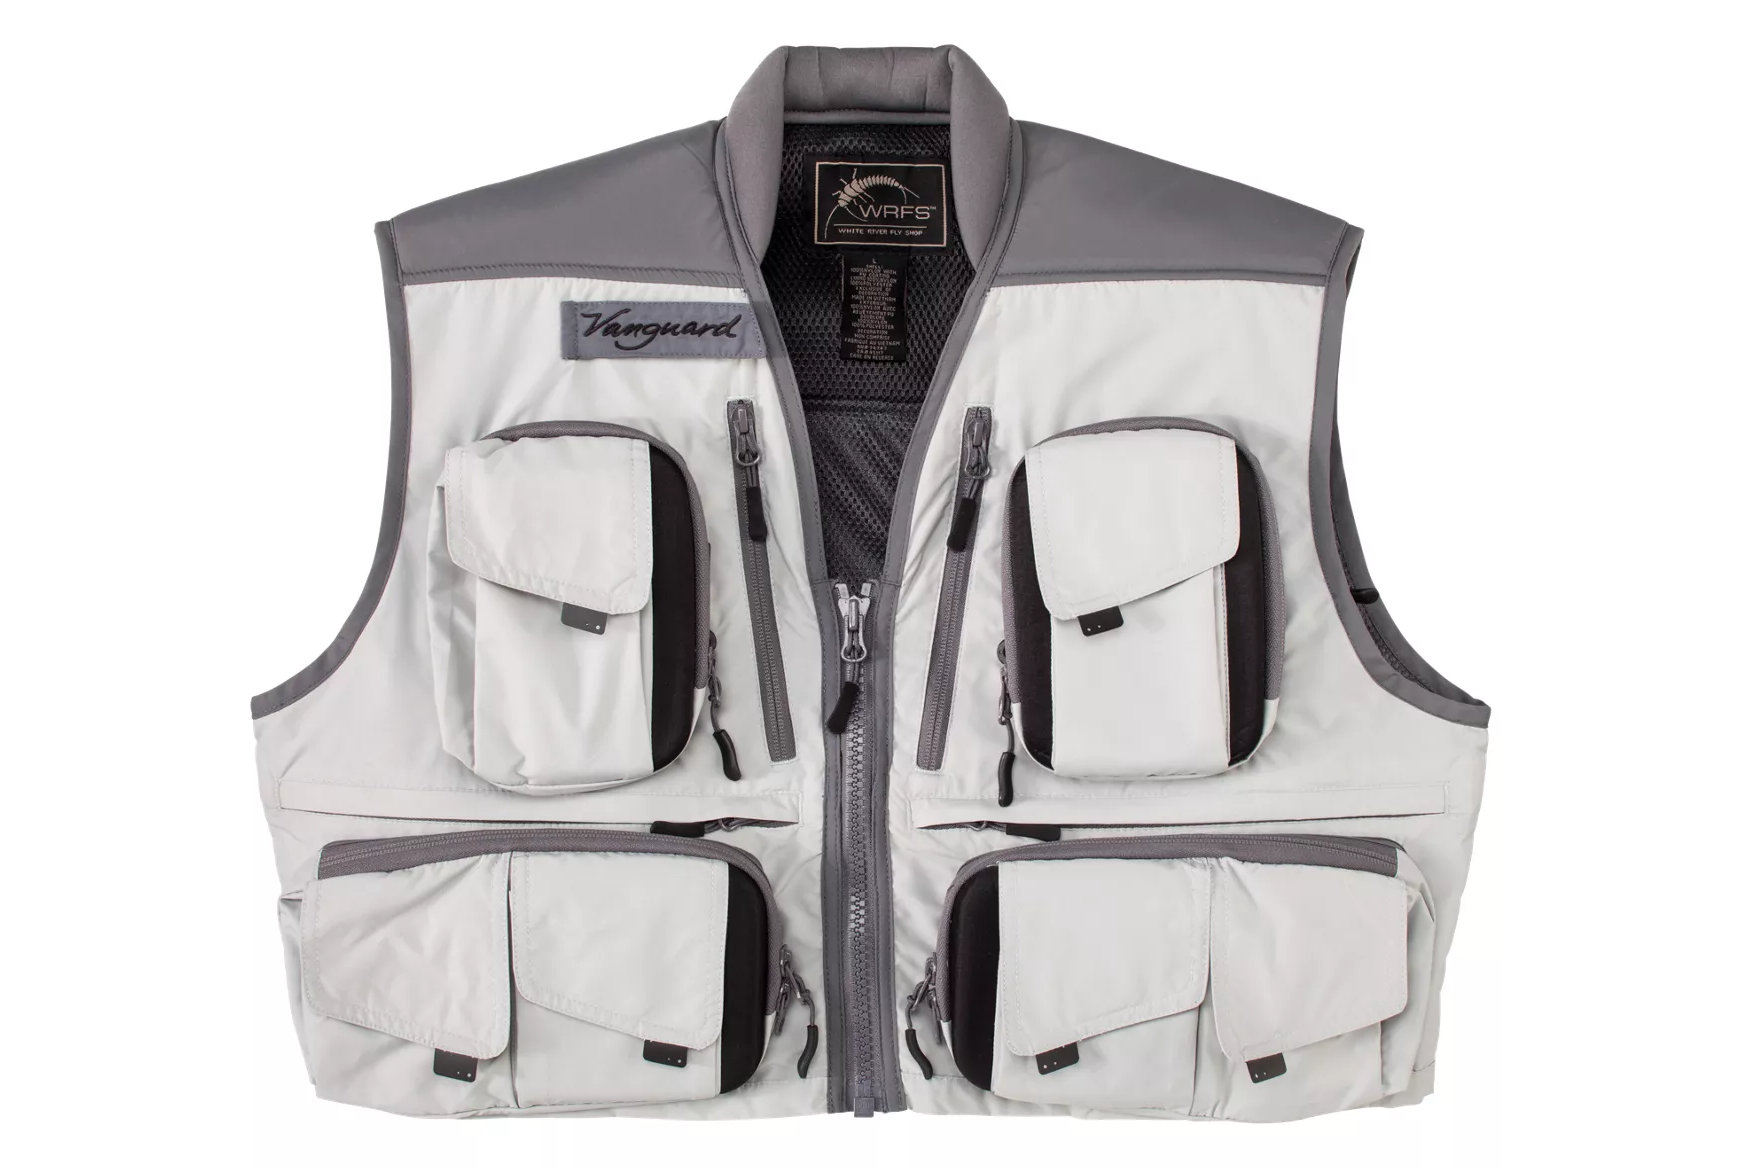 White River Fly Shop Vanguard Fly Vest – $79.97